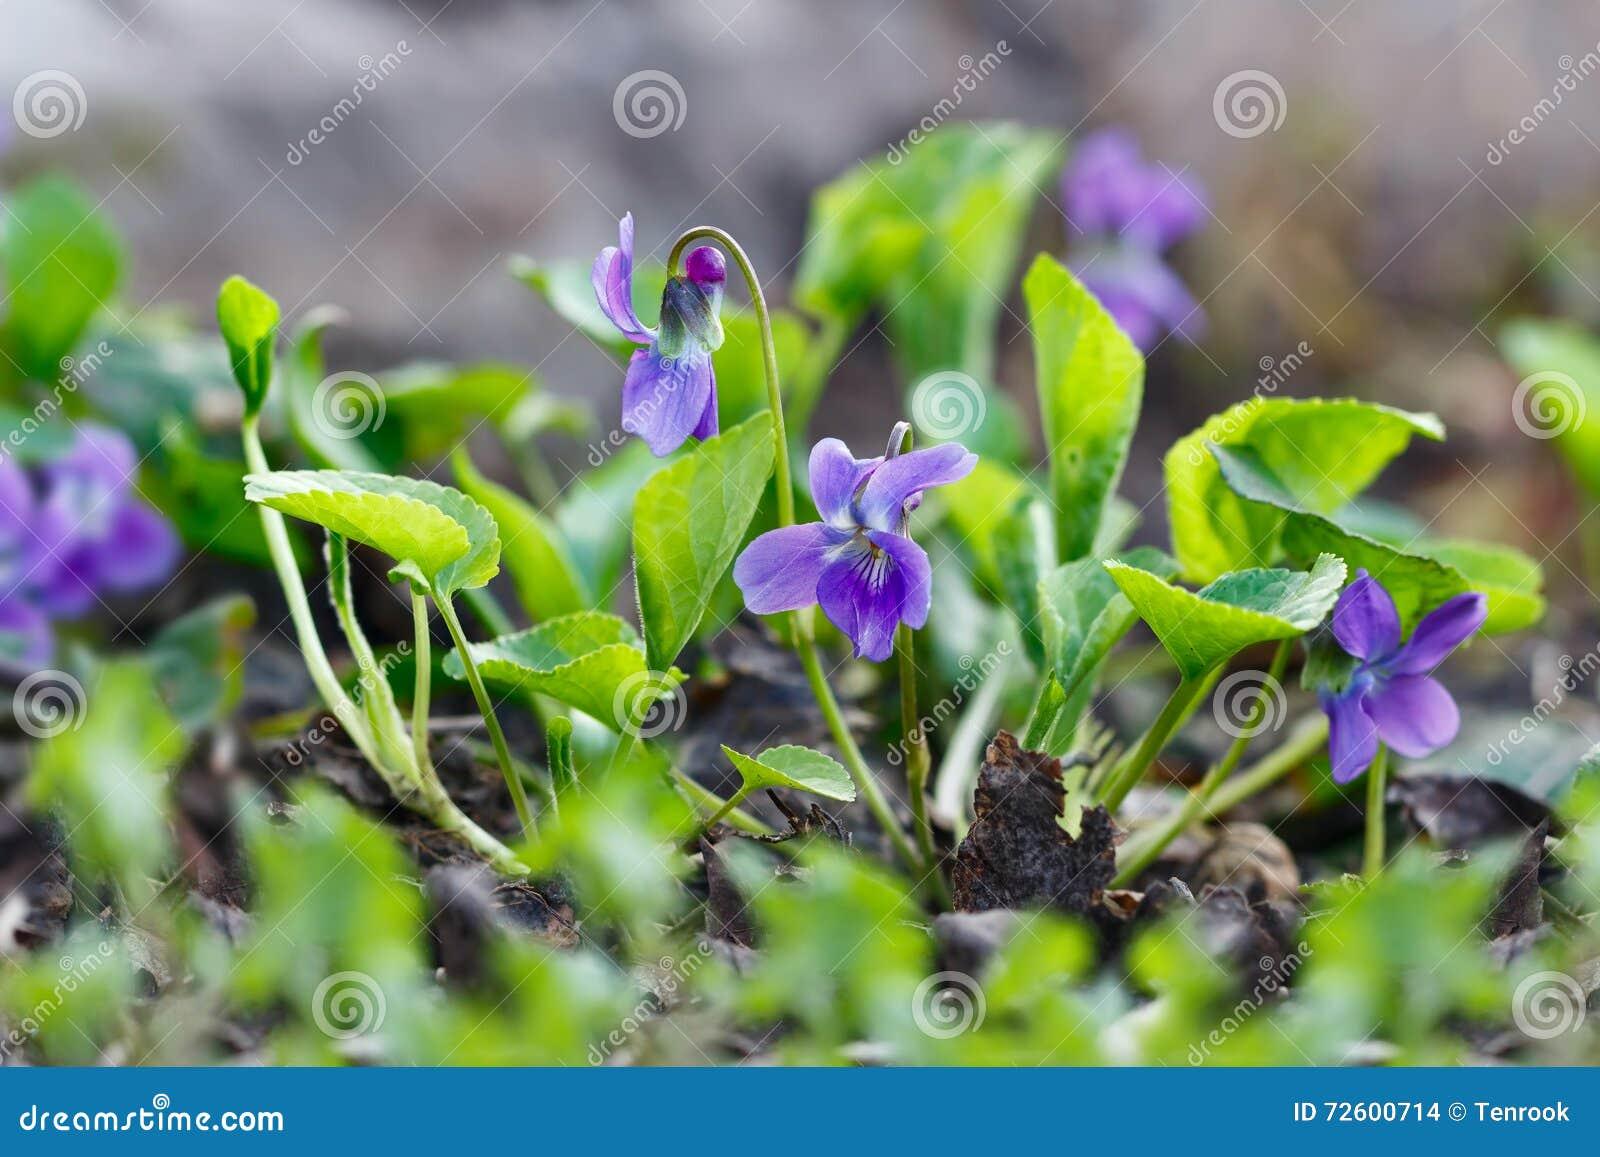 Closeup purple flowers blooming in spring in wild meadow nature download comp mightylinksfo